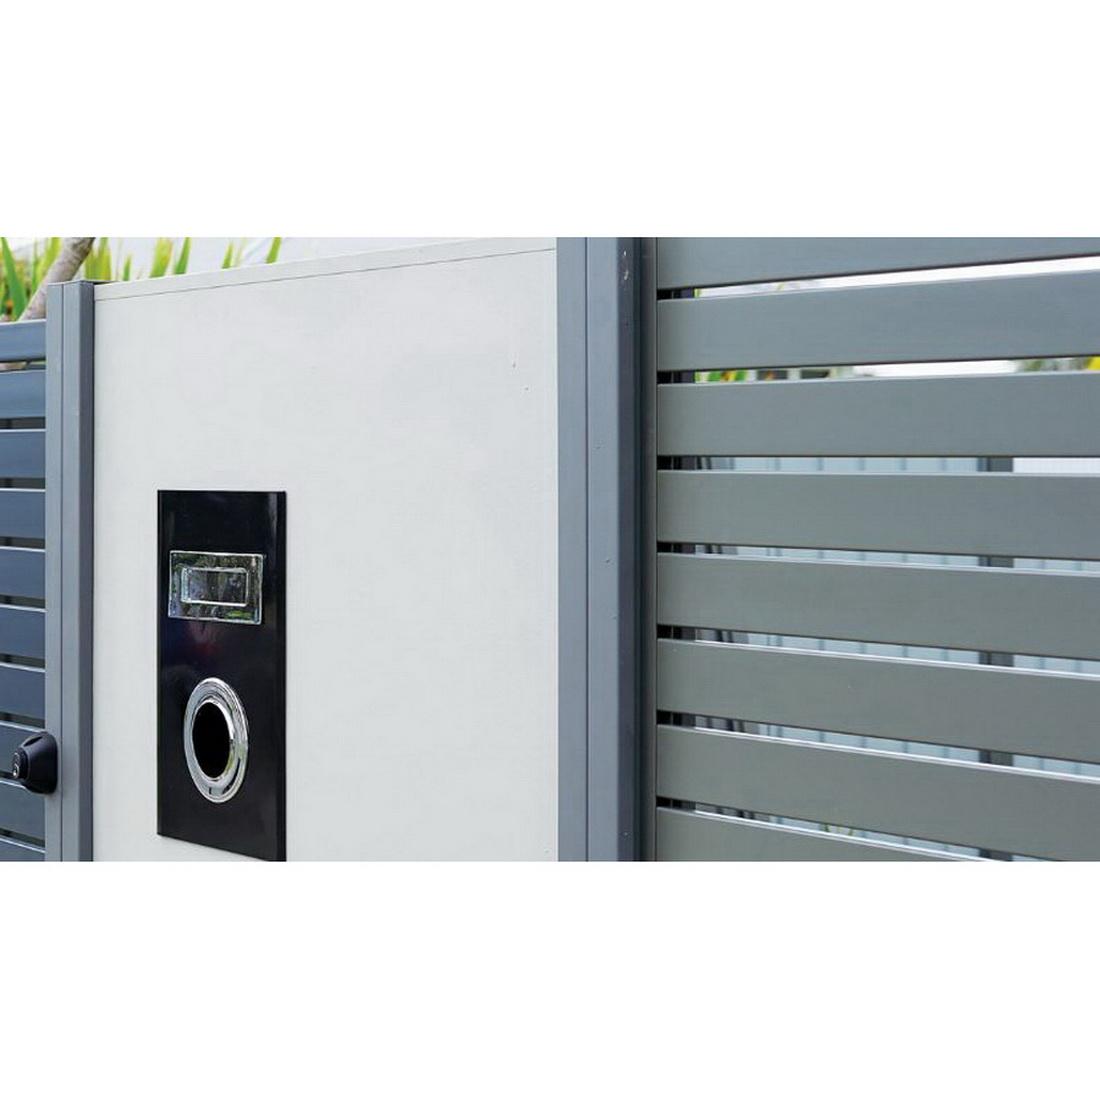 Styleline 1.5/0.3 Fence Panel 1800 x 2420mm